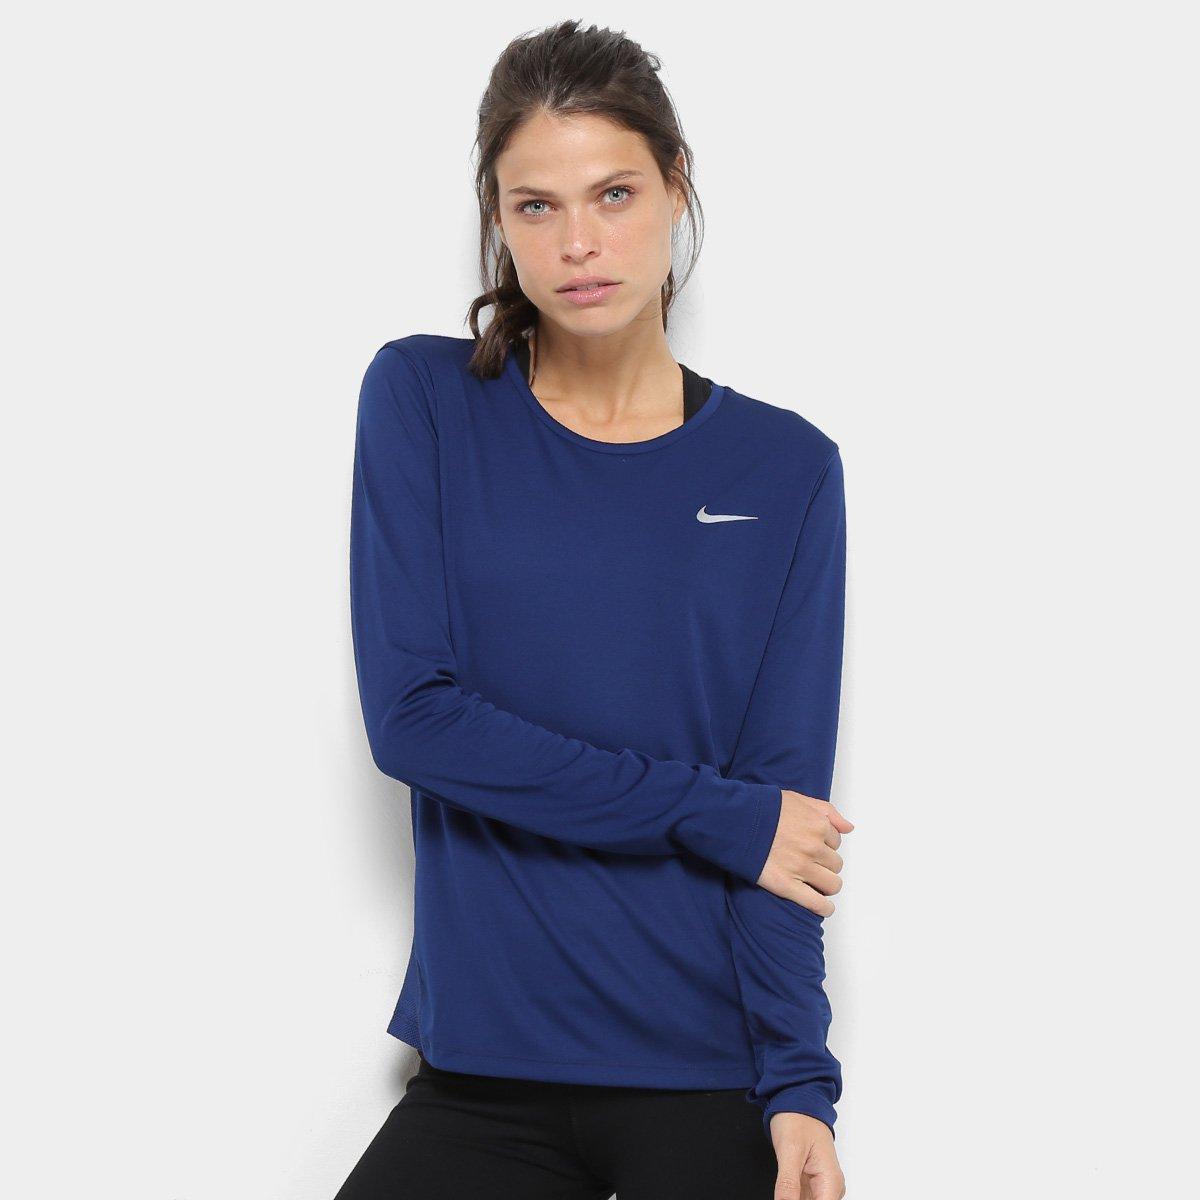 260d3b5574159 Camiseta Nike Miler Manga Longa - Azul - Compre Agora